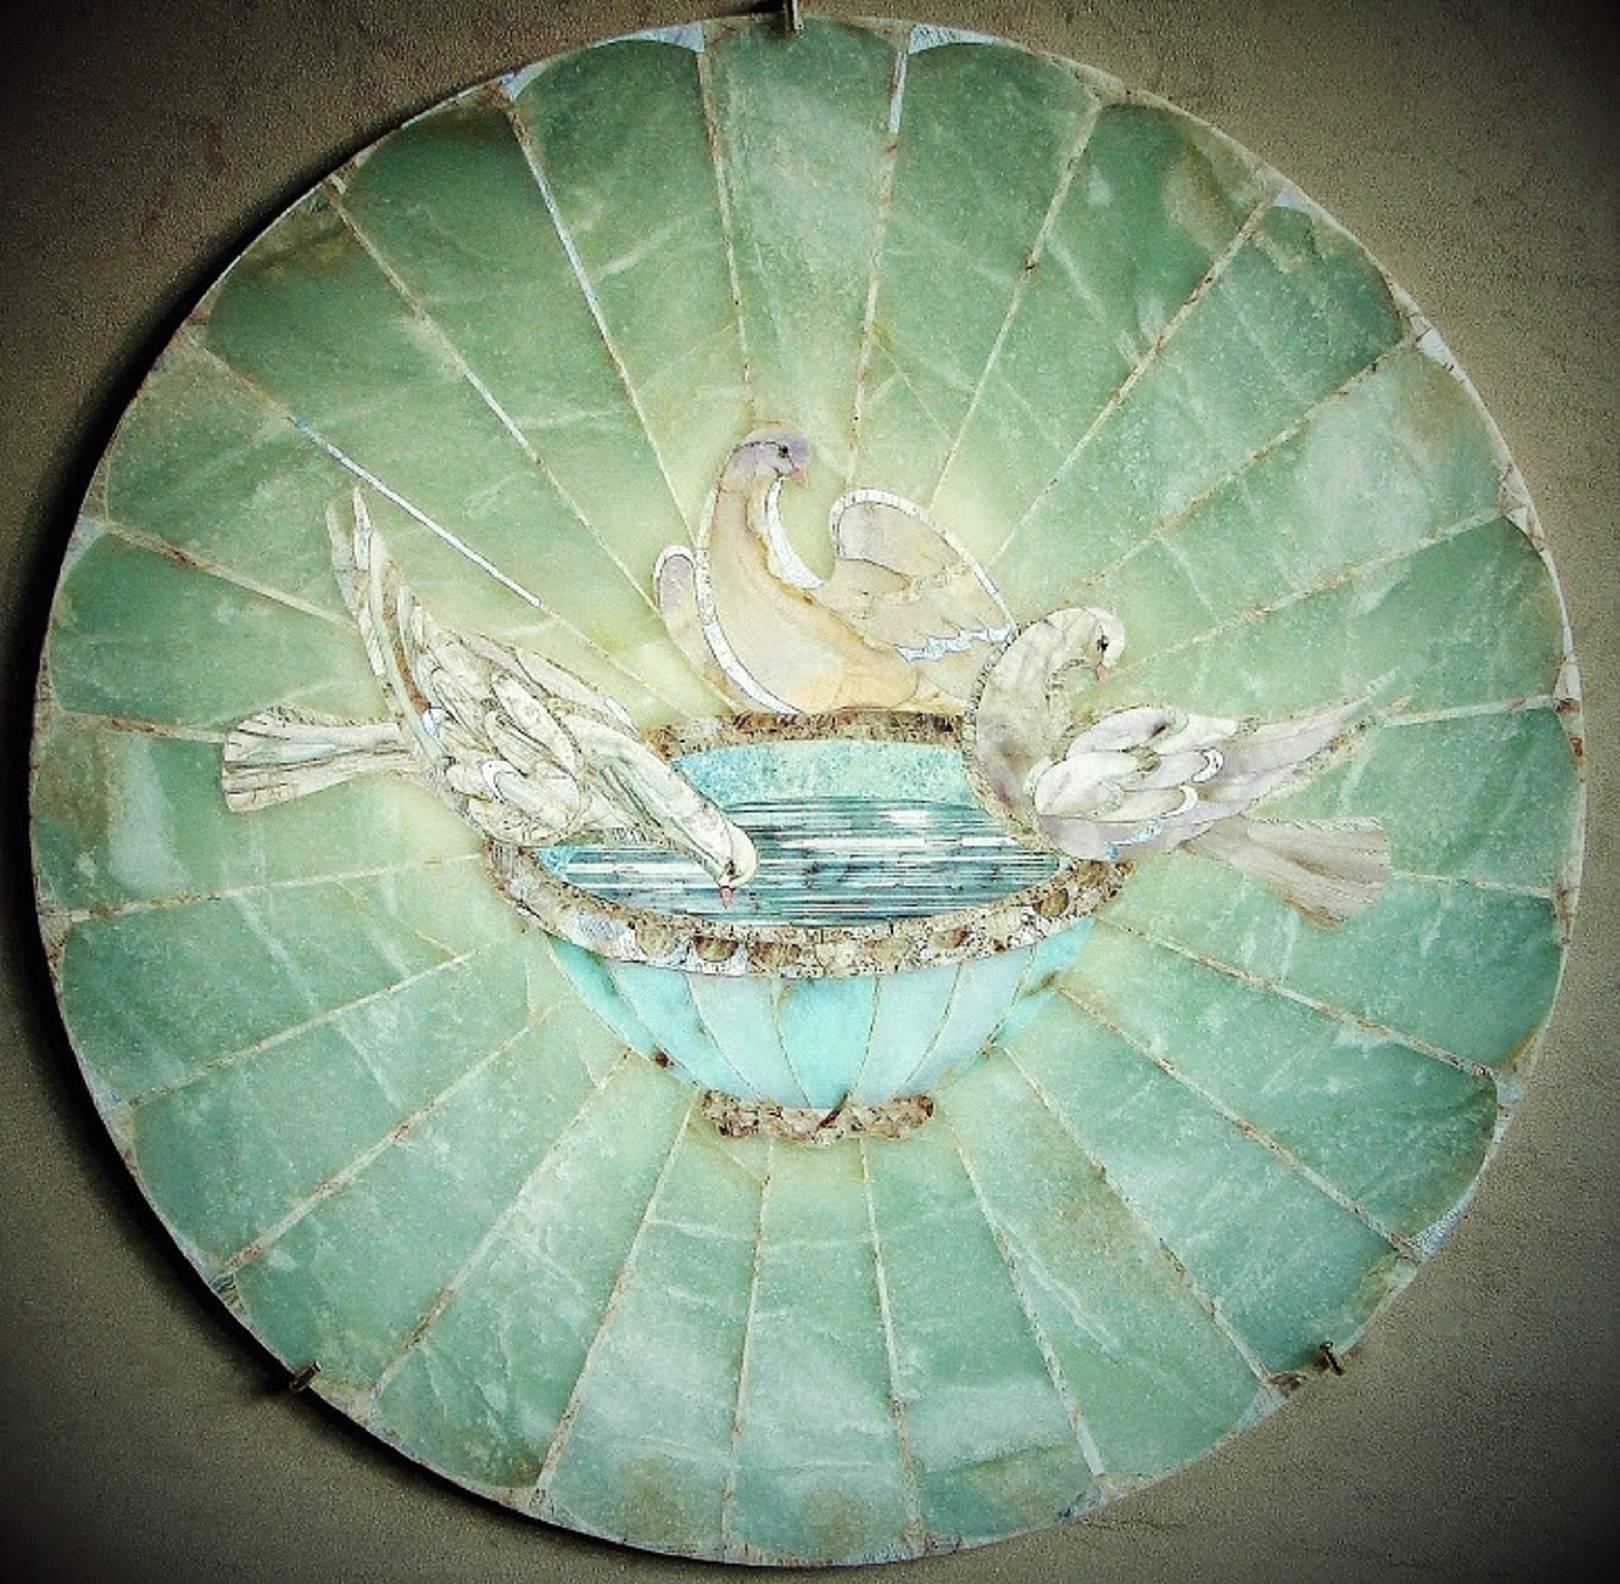 """Голуби Плиния""""Троица"" флорентийская мозаика: нефрит голубой, хризопраз, хризопал, агат, виолан, халцедон сиреневый, беломорит (лунный камень) 53 см."